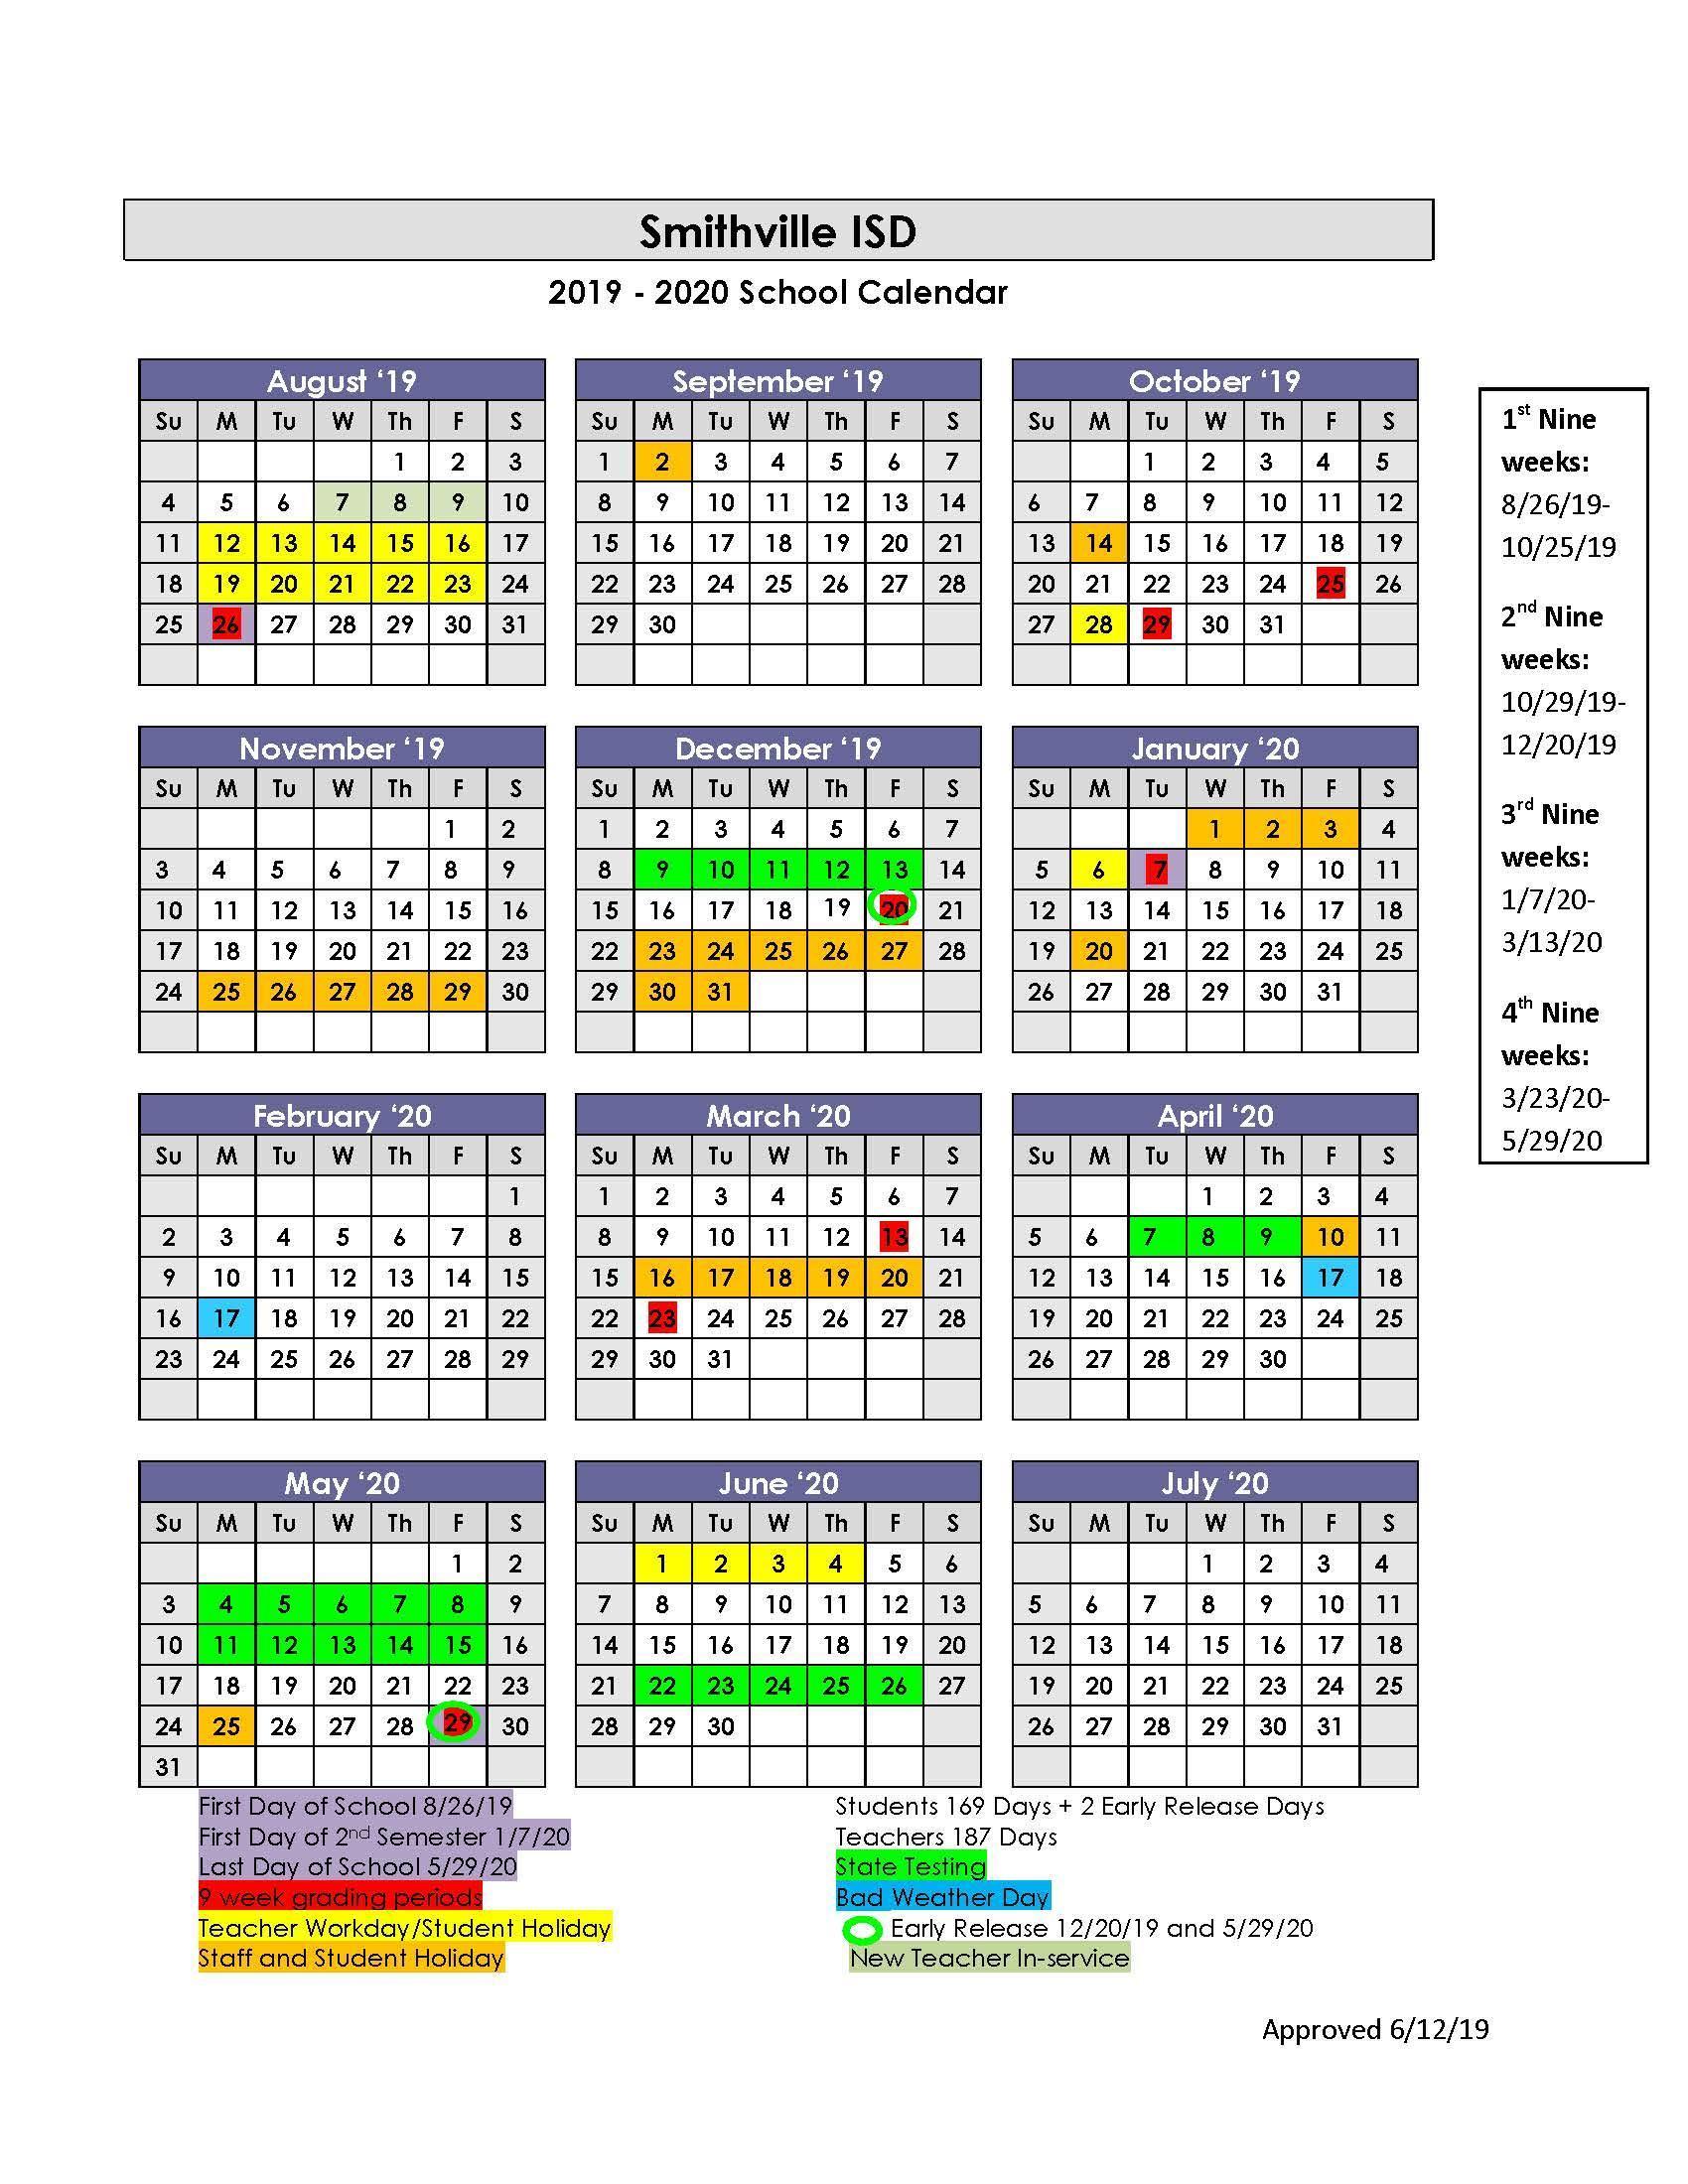 Lisd Calendar 2020.Sisd Academic Calendar School Board Smithville Independent